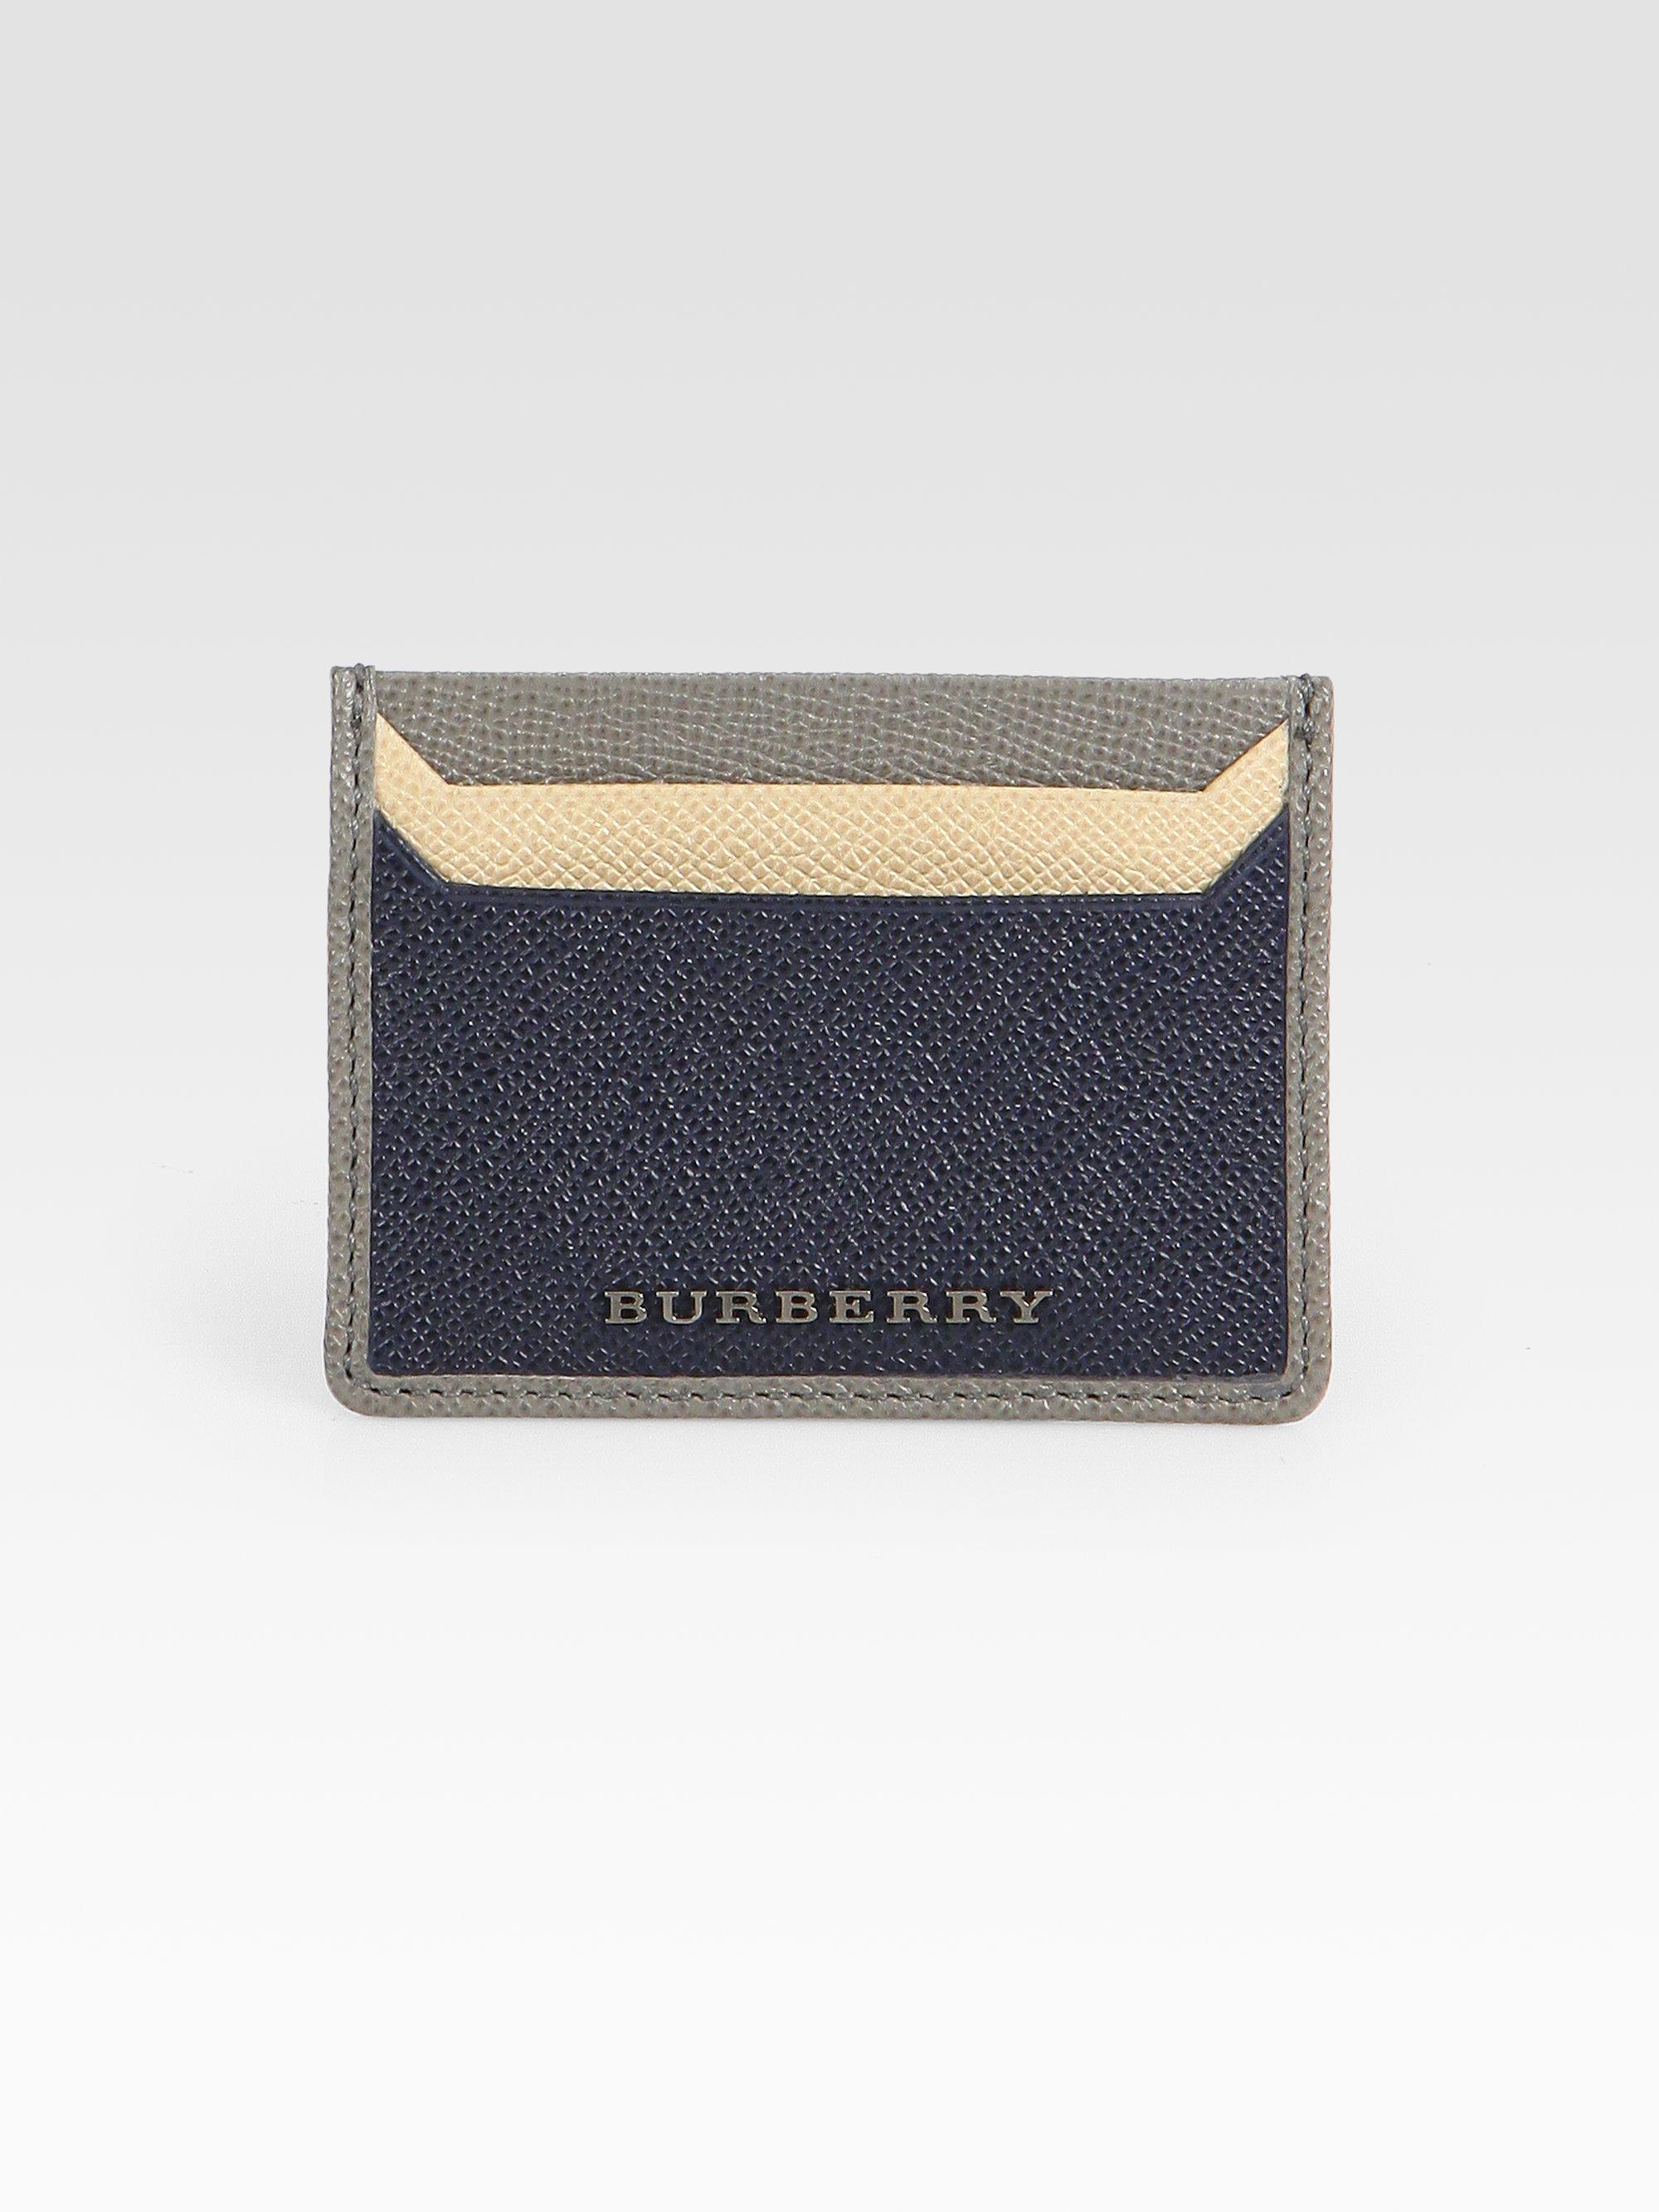 Burberry Card Holder Mens